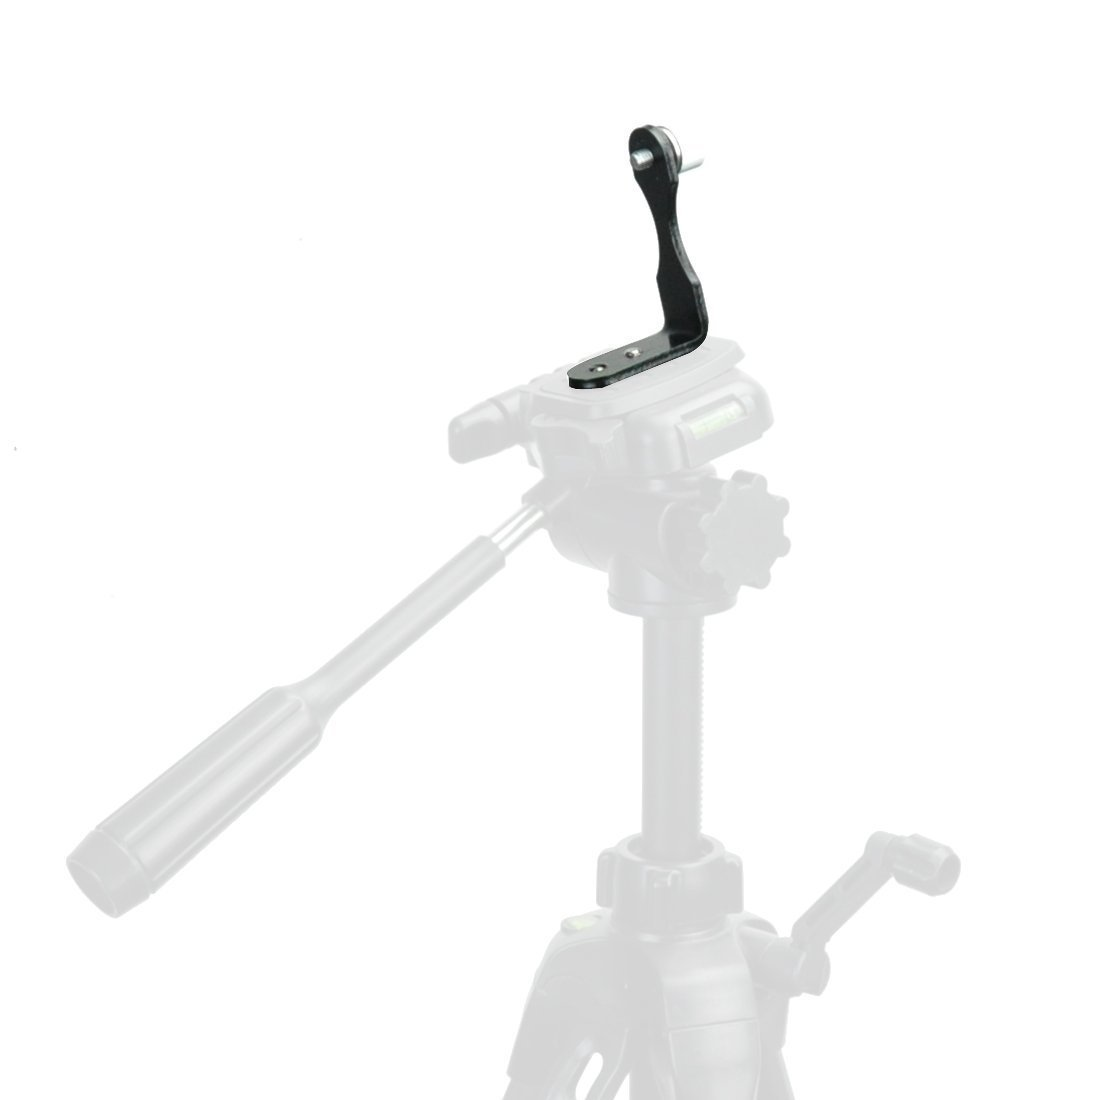 Cameras & Photo Solomark Versatile Tripod Mounting Adapter For Roof Binoculars